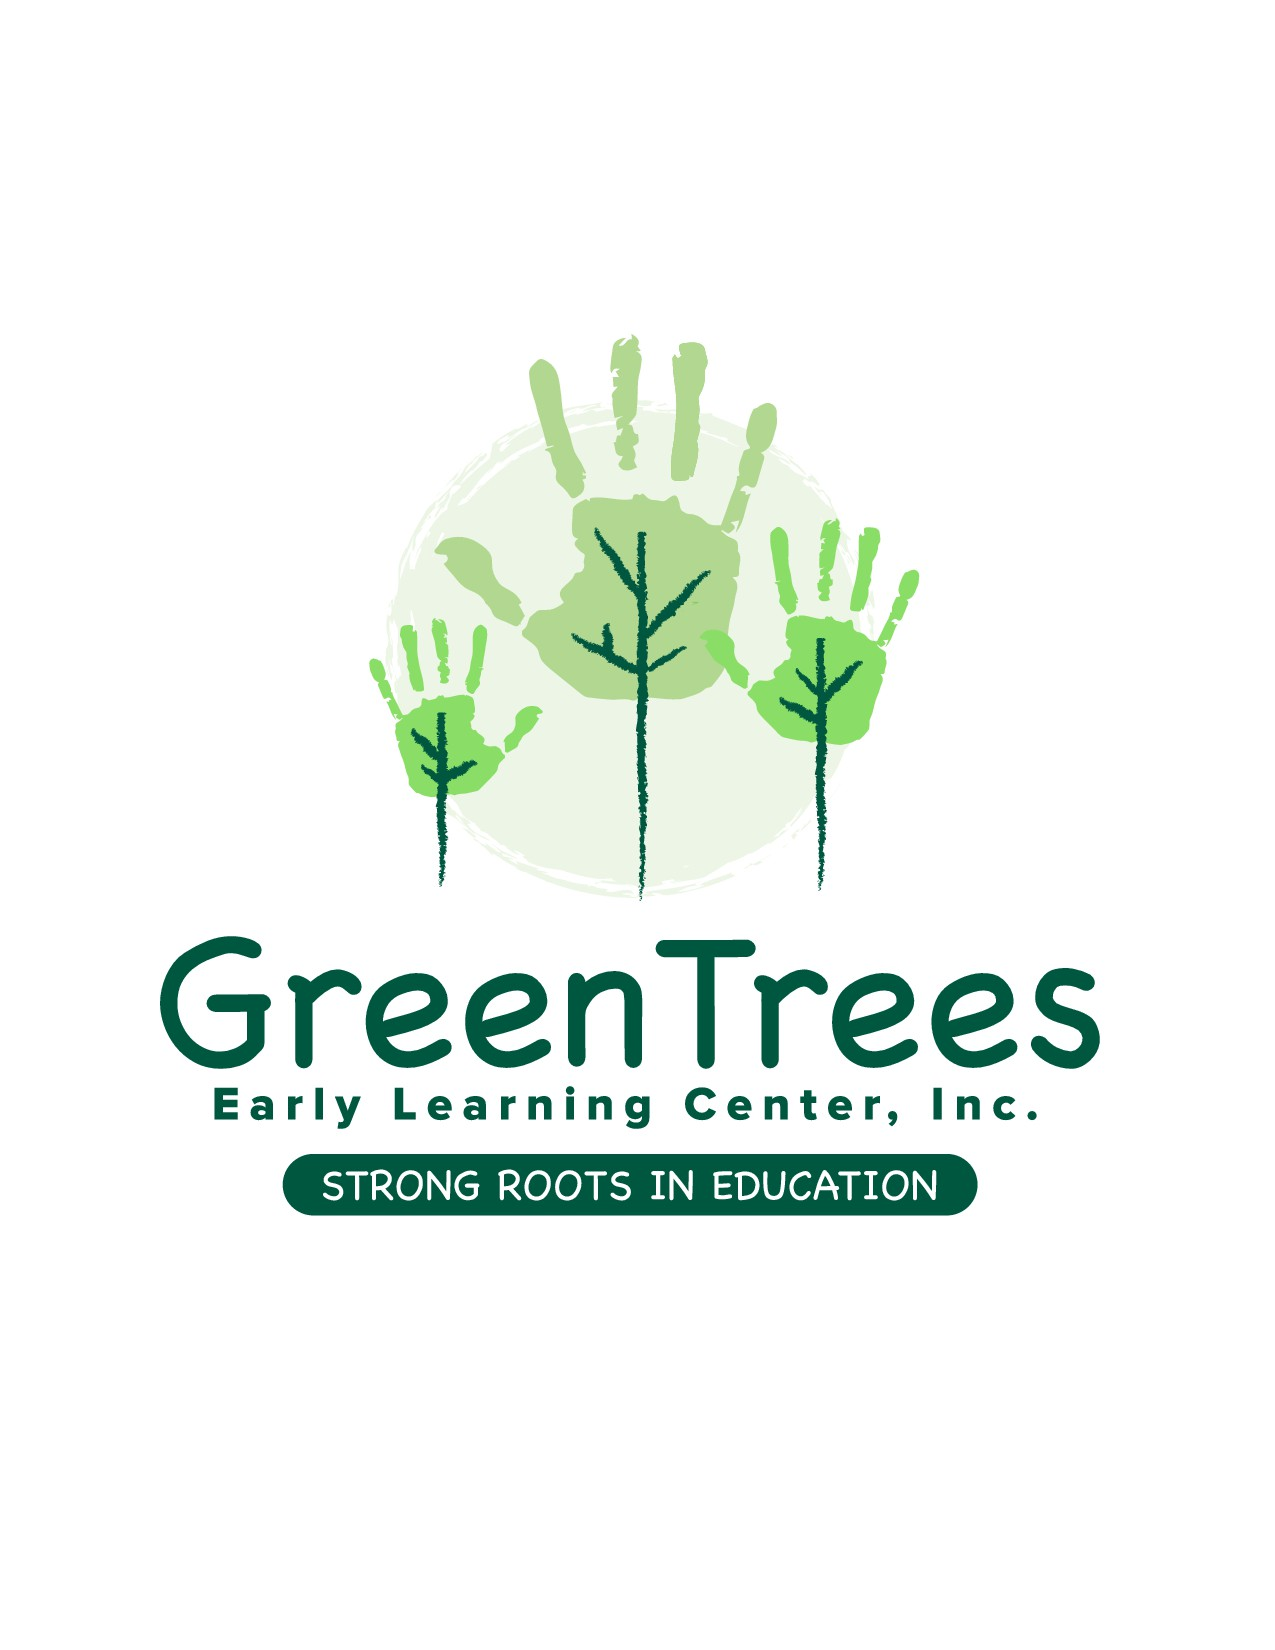 Child Care Center Needs An Organic Logo Design